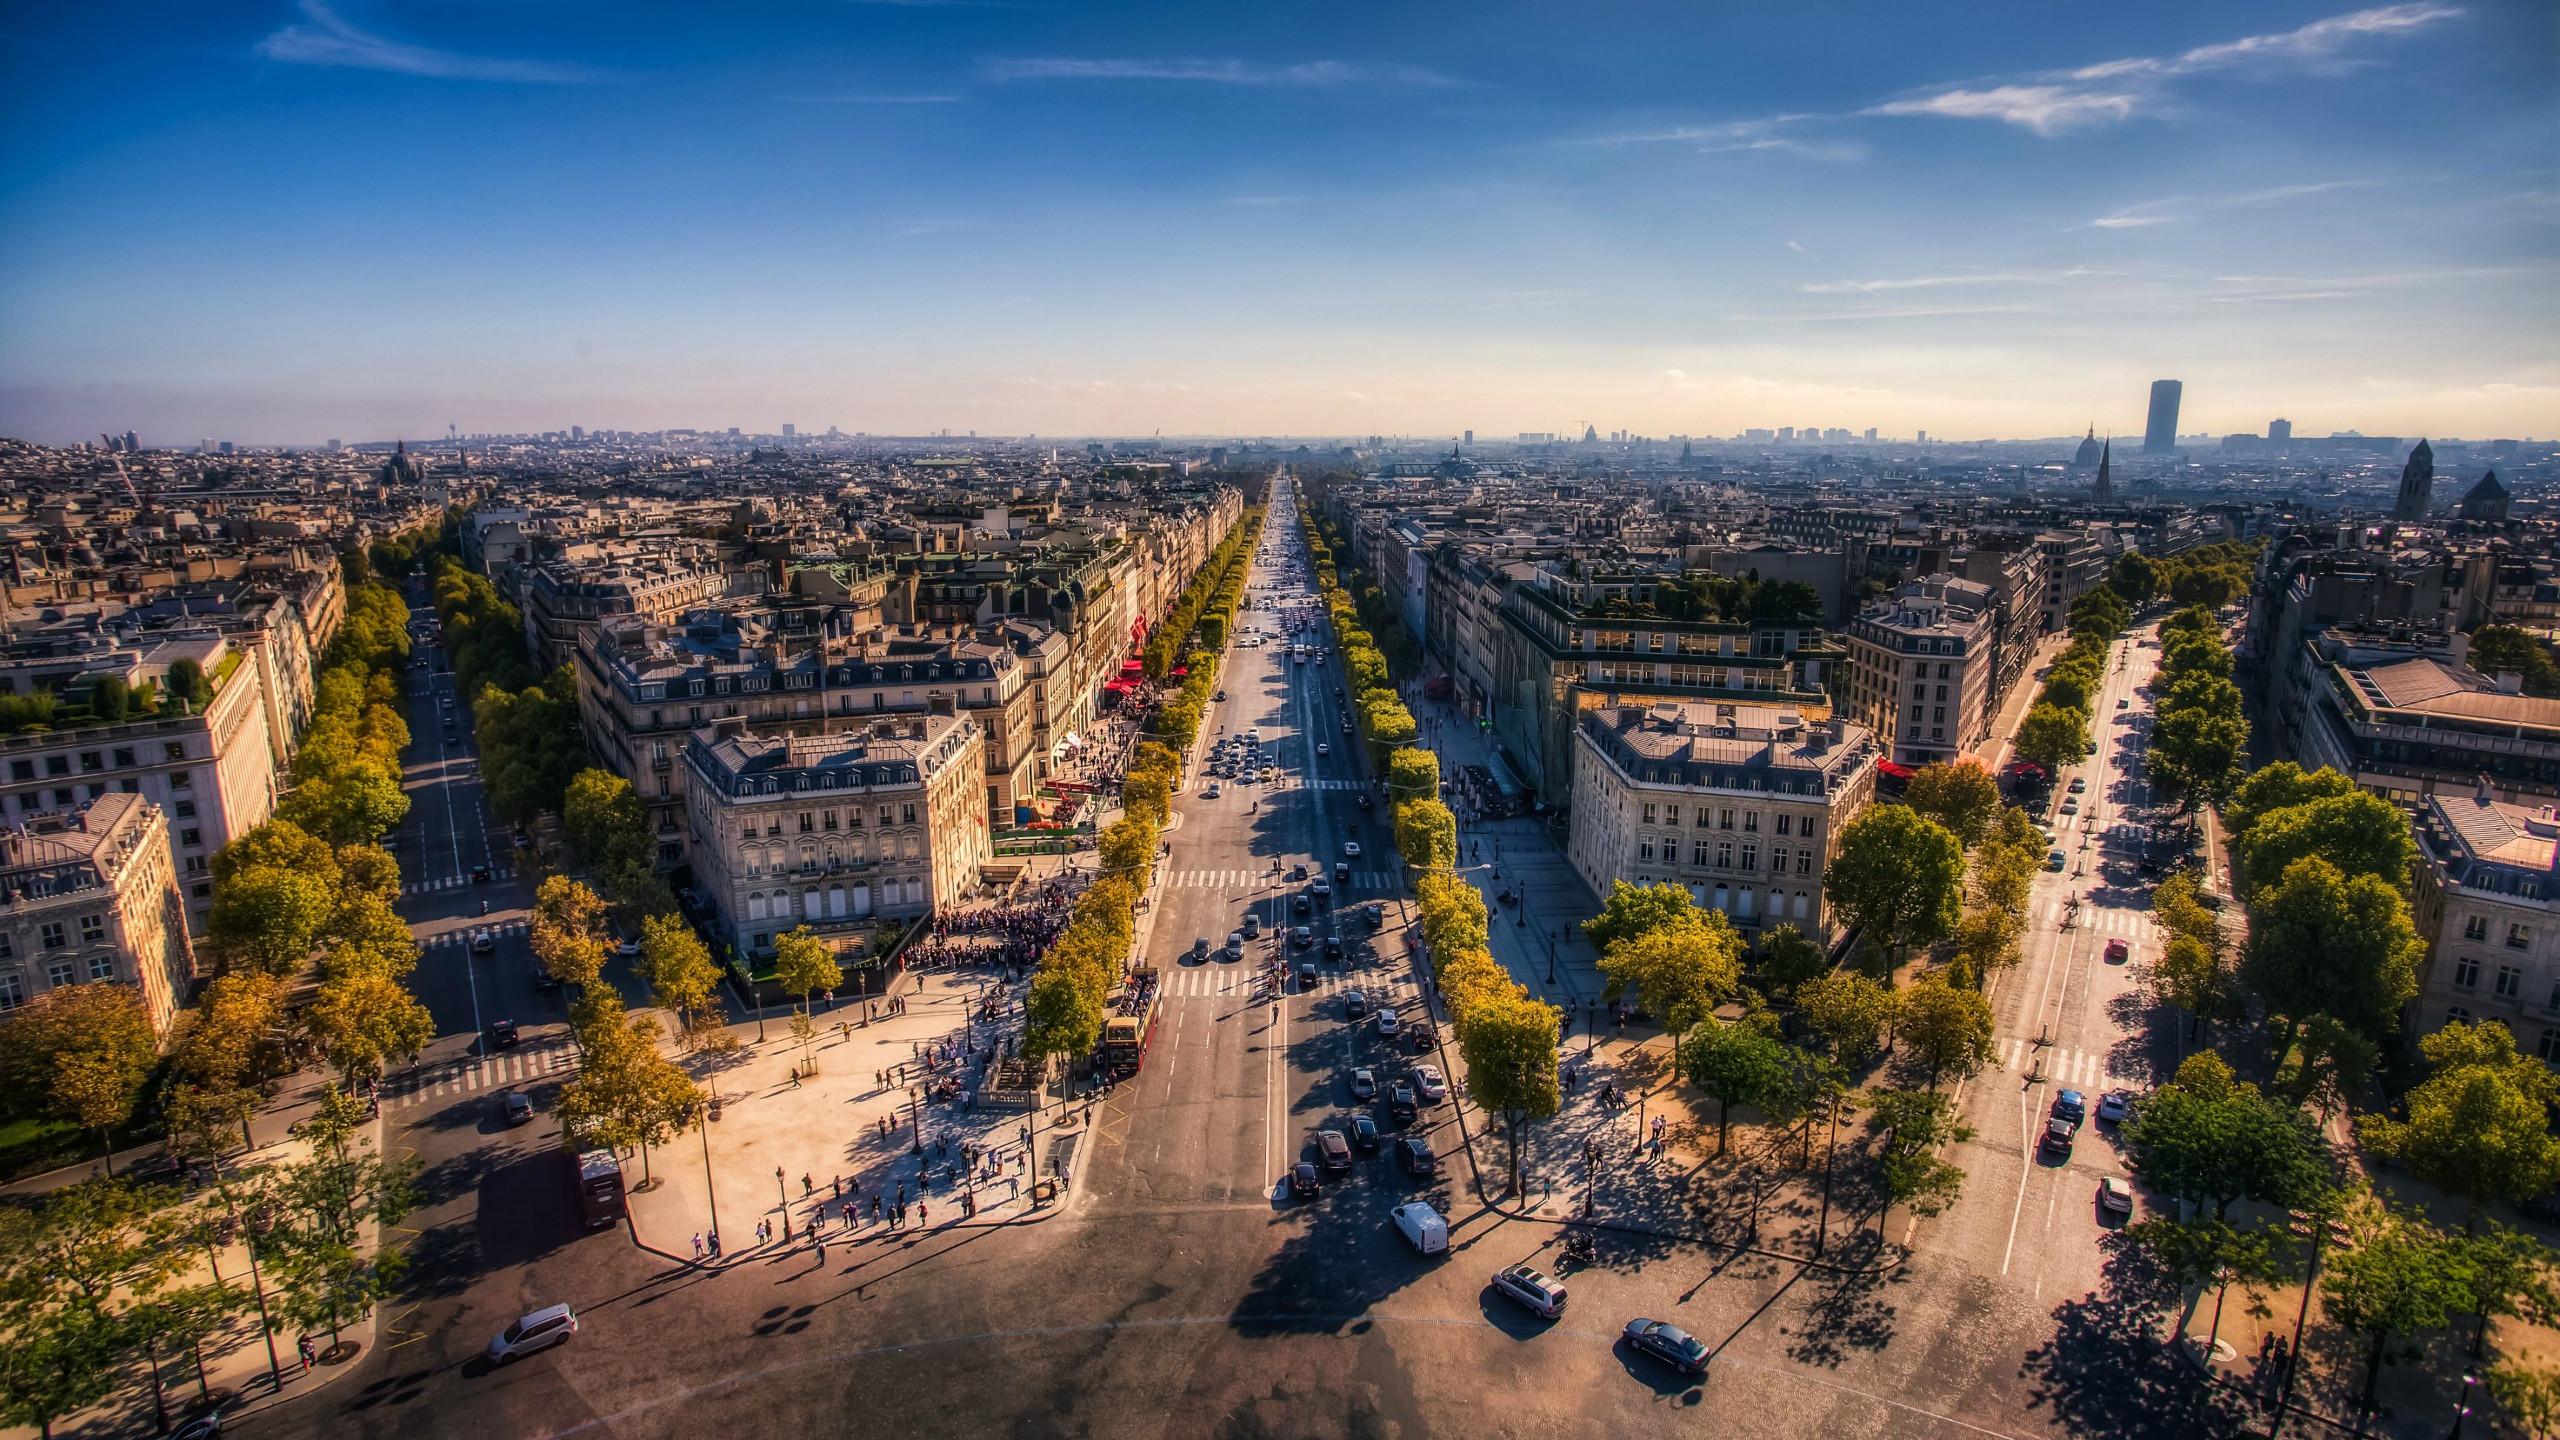 General 2560x1440 city horizon Paris France